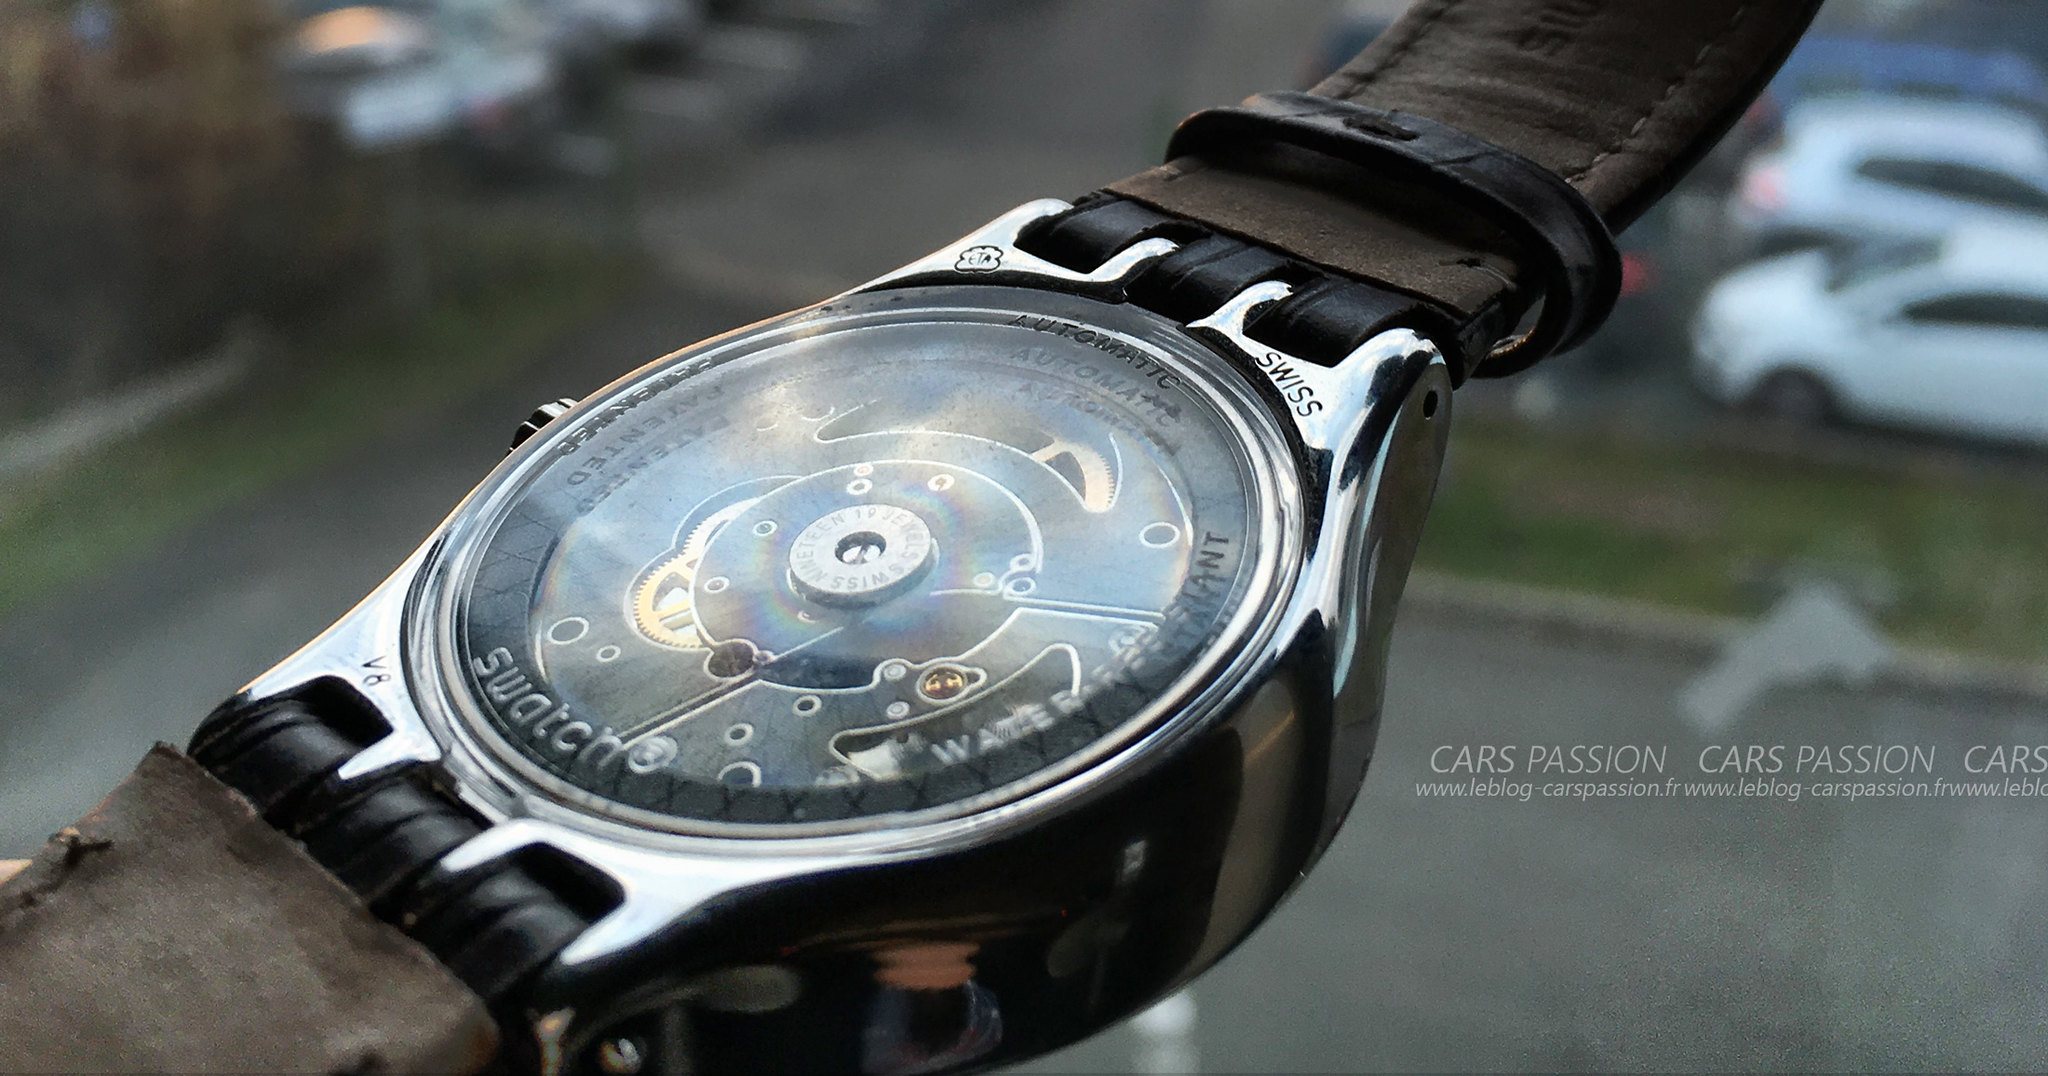 montres-automatique-swatch-sistem51-irony-fly-9